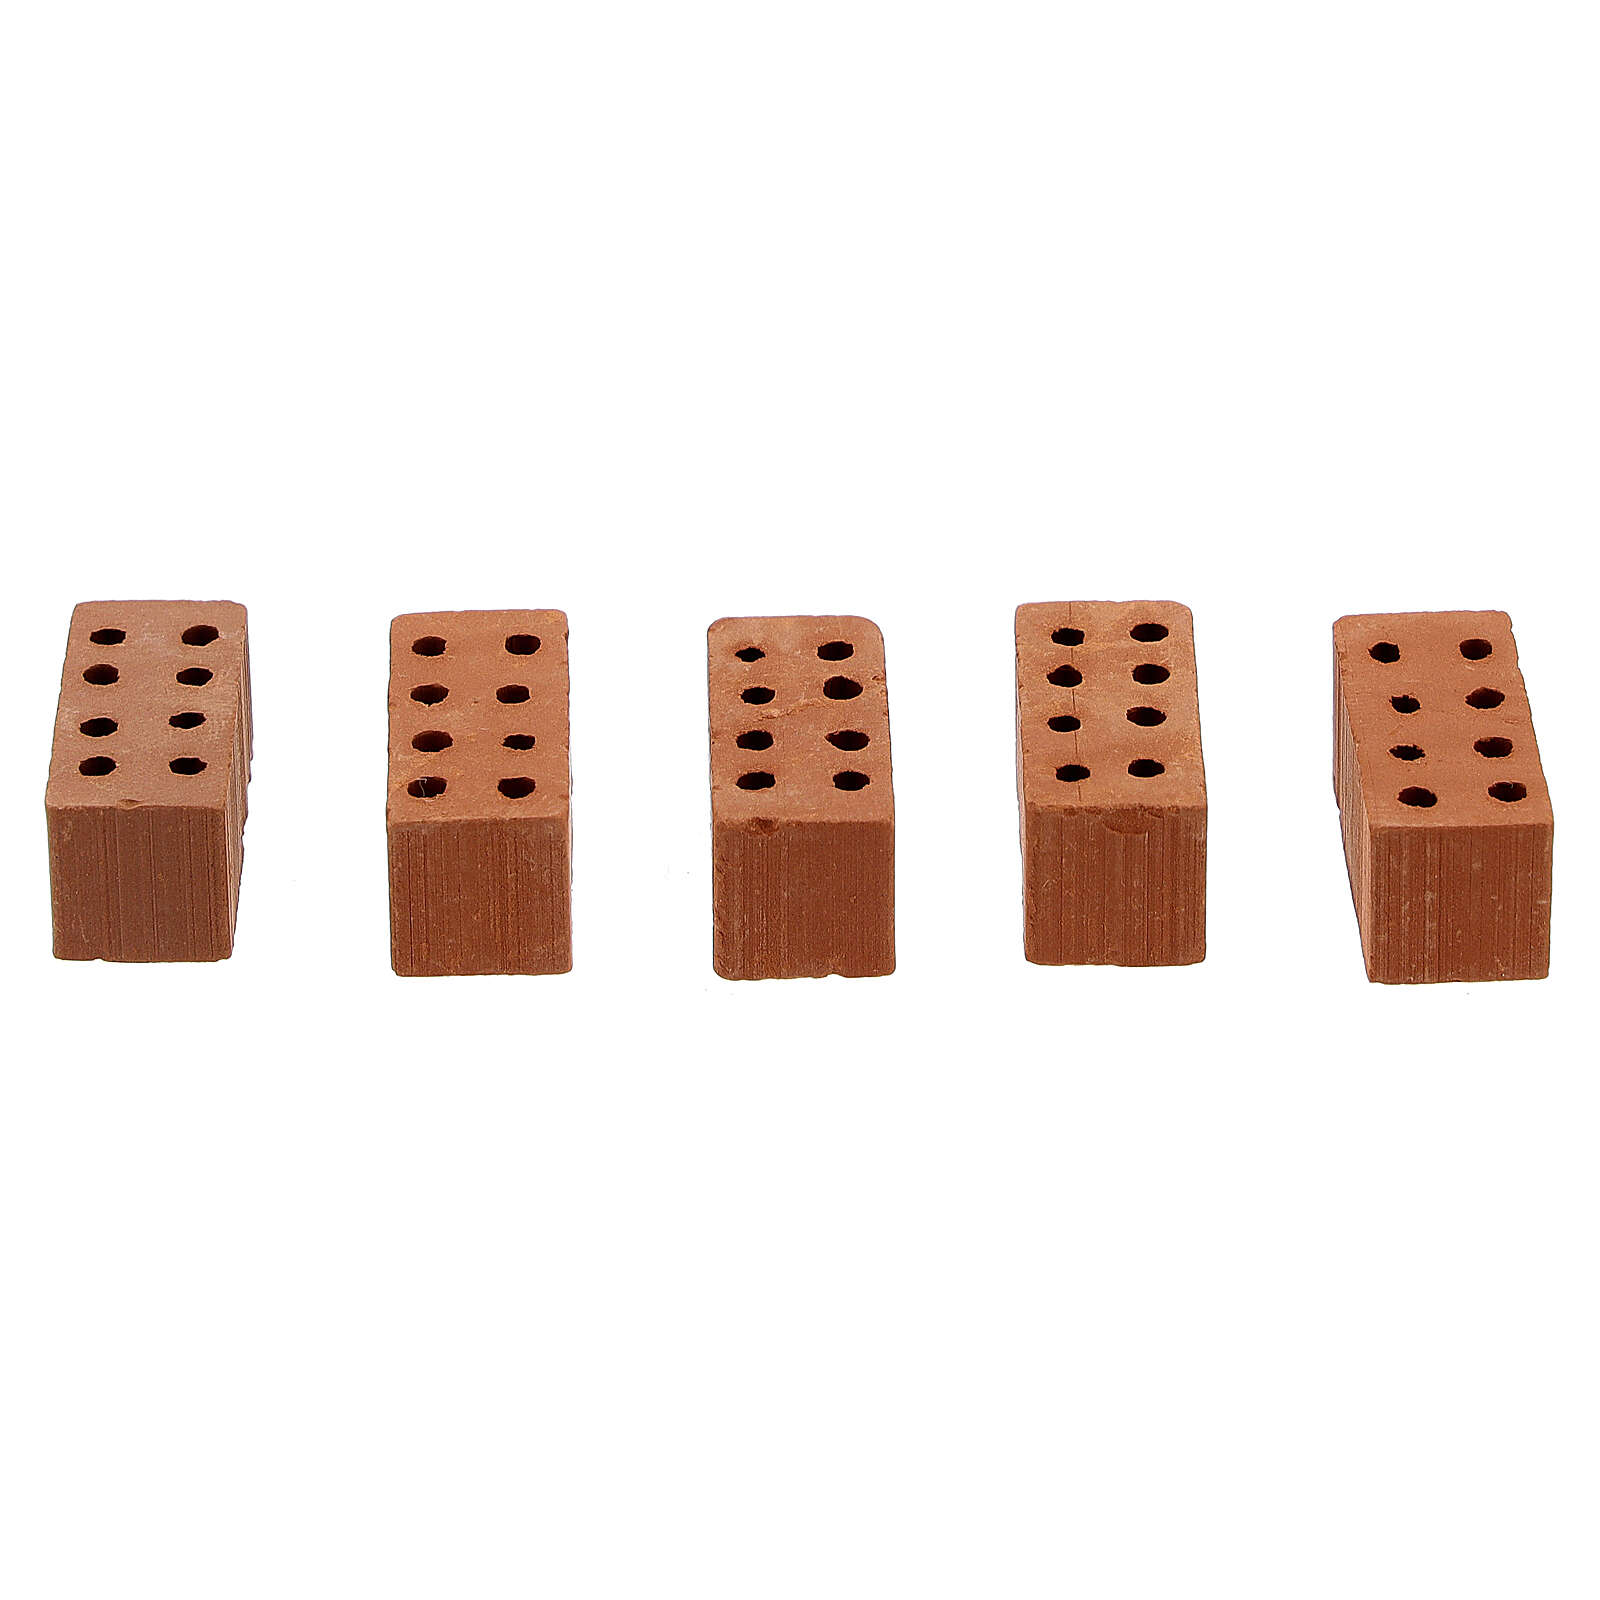 Mattoncini rettangolari terracotta 1x2x1 cm 100 pz 4